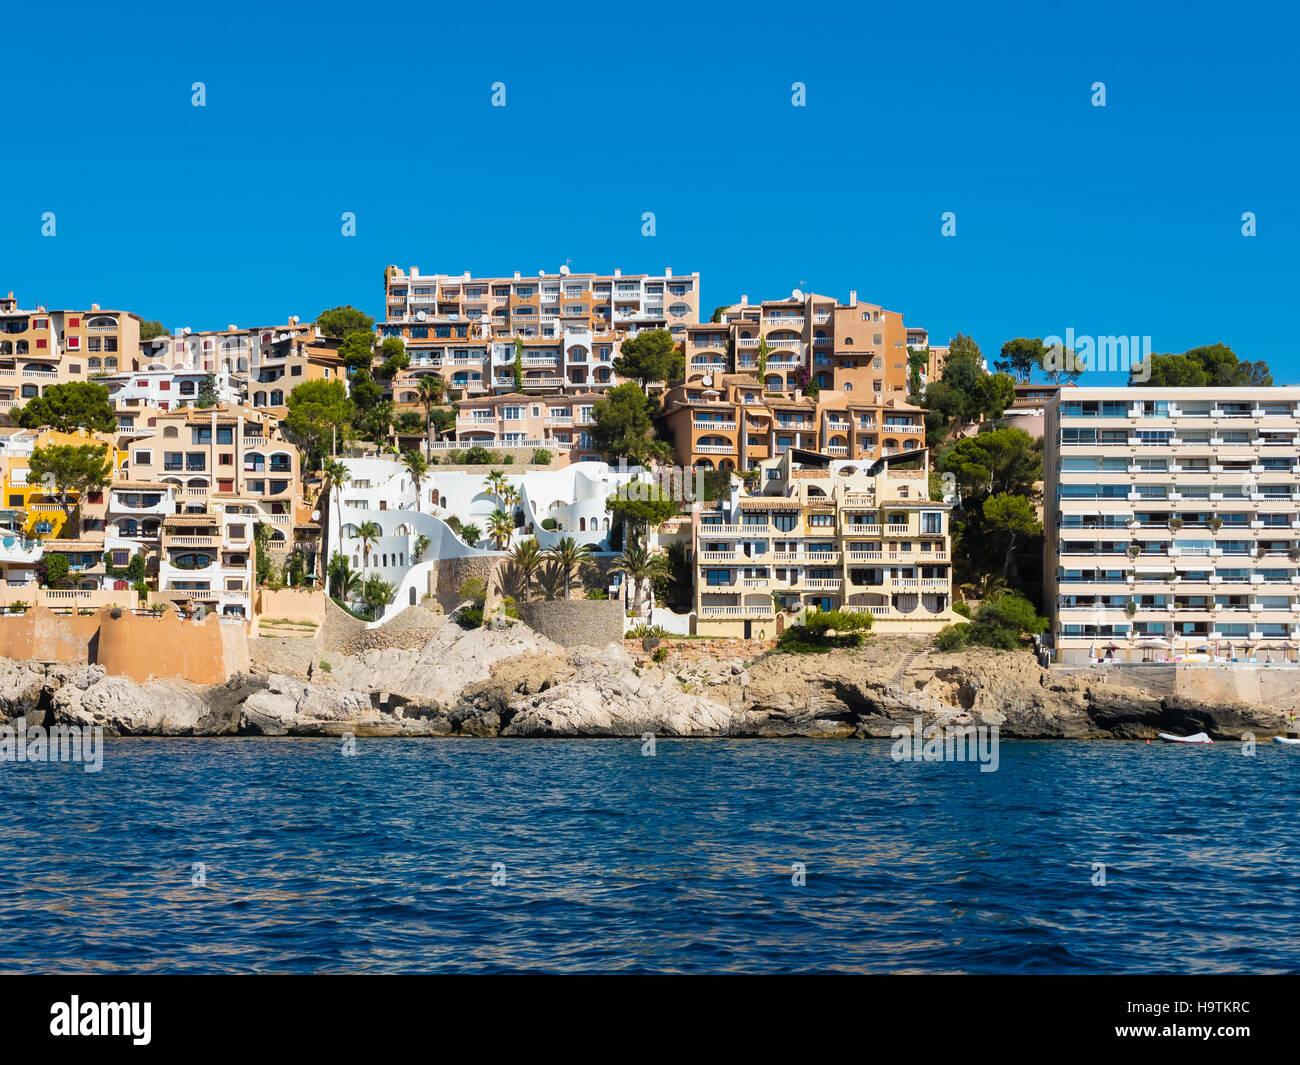 Apartments, Cala Fornels, Majorca, Balearic Islands, Spain - Stock Image